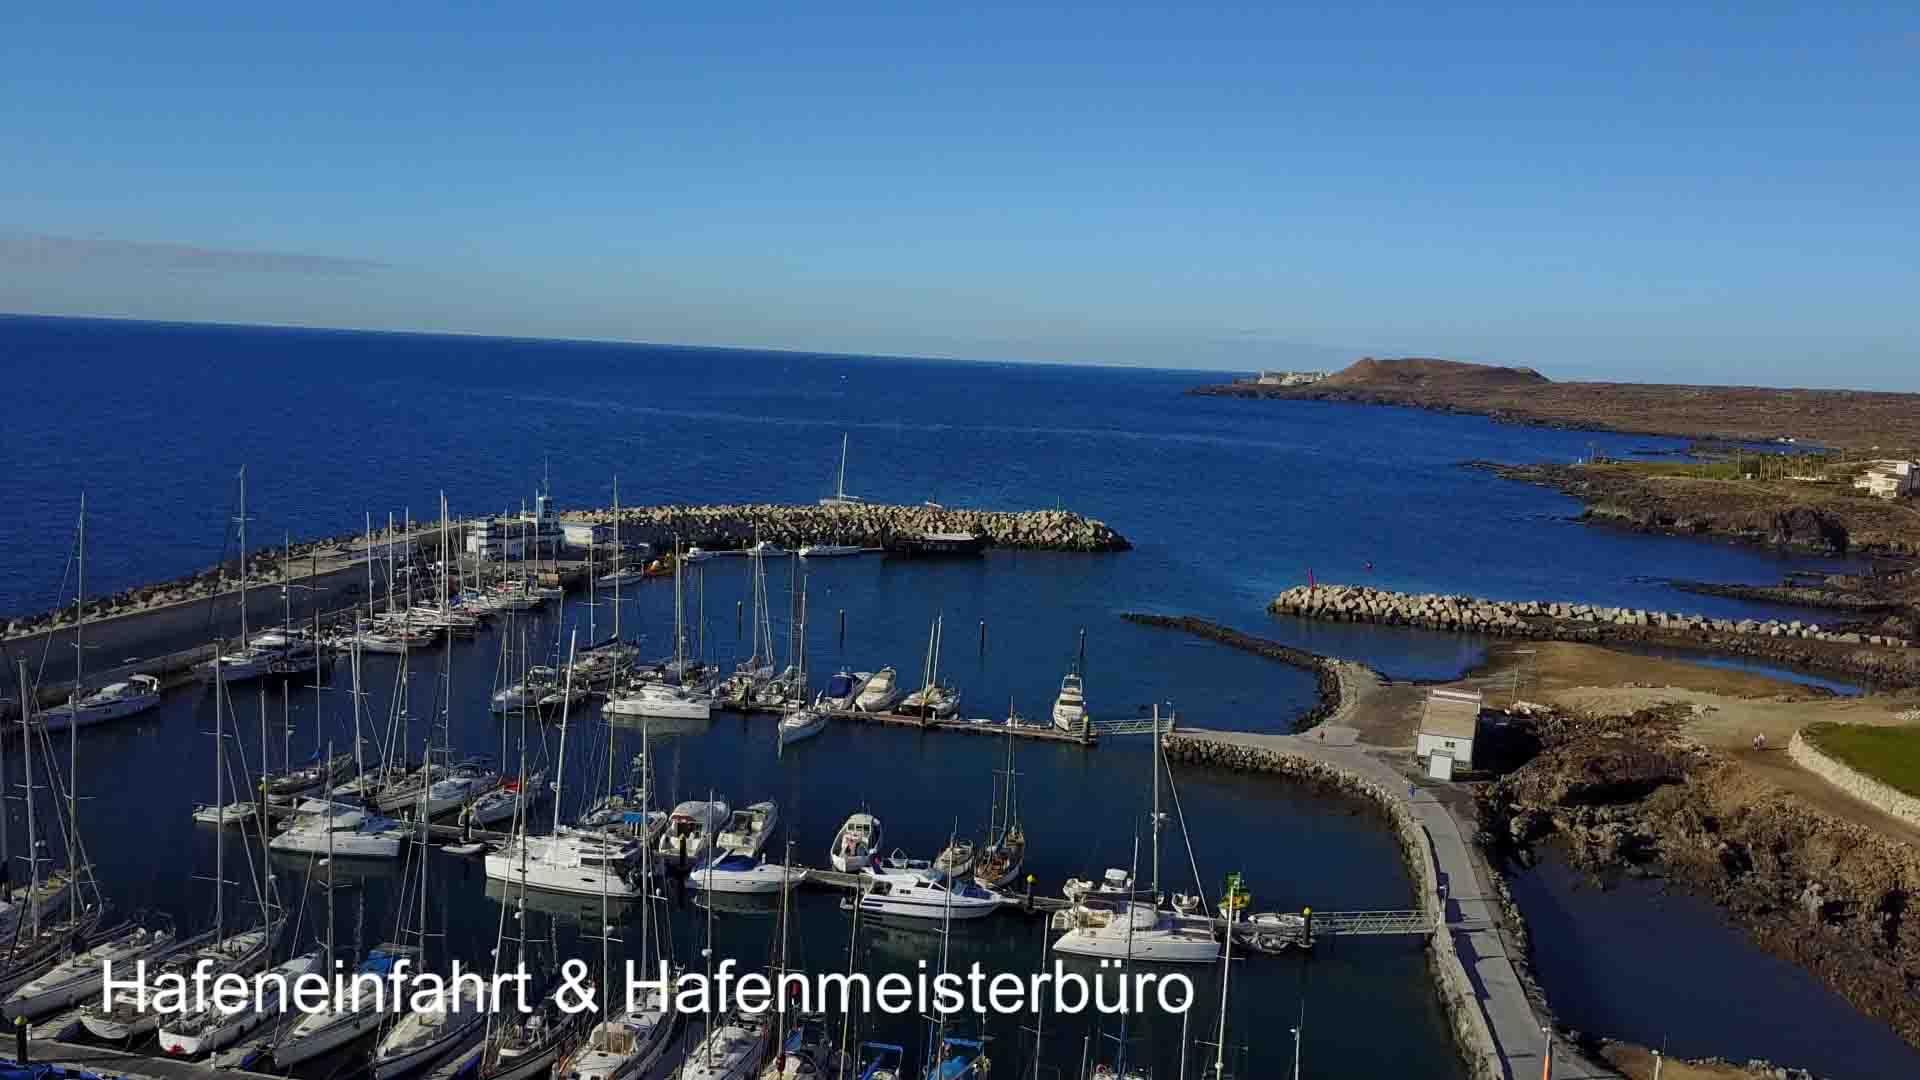 Drohe Lugtaufnahme von Marina Saint Miguel - Teneriffa